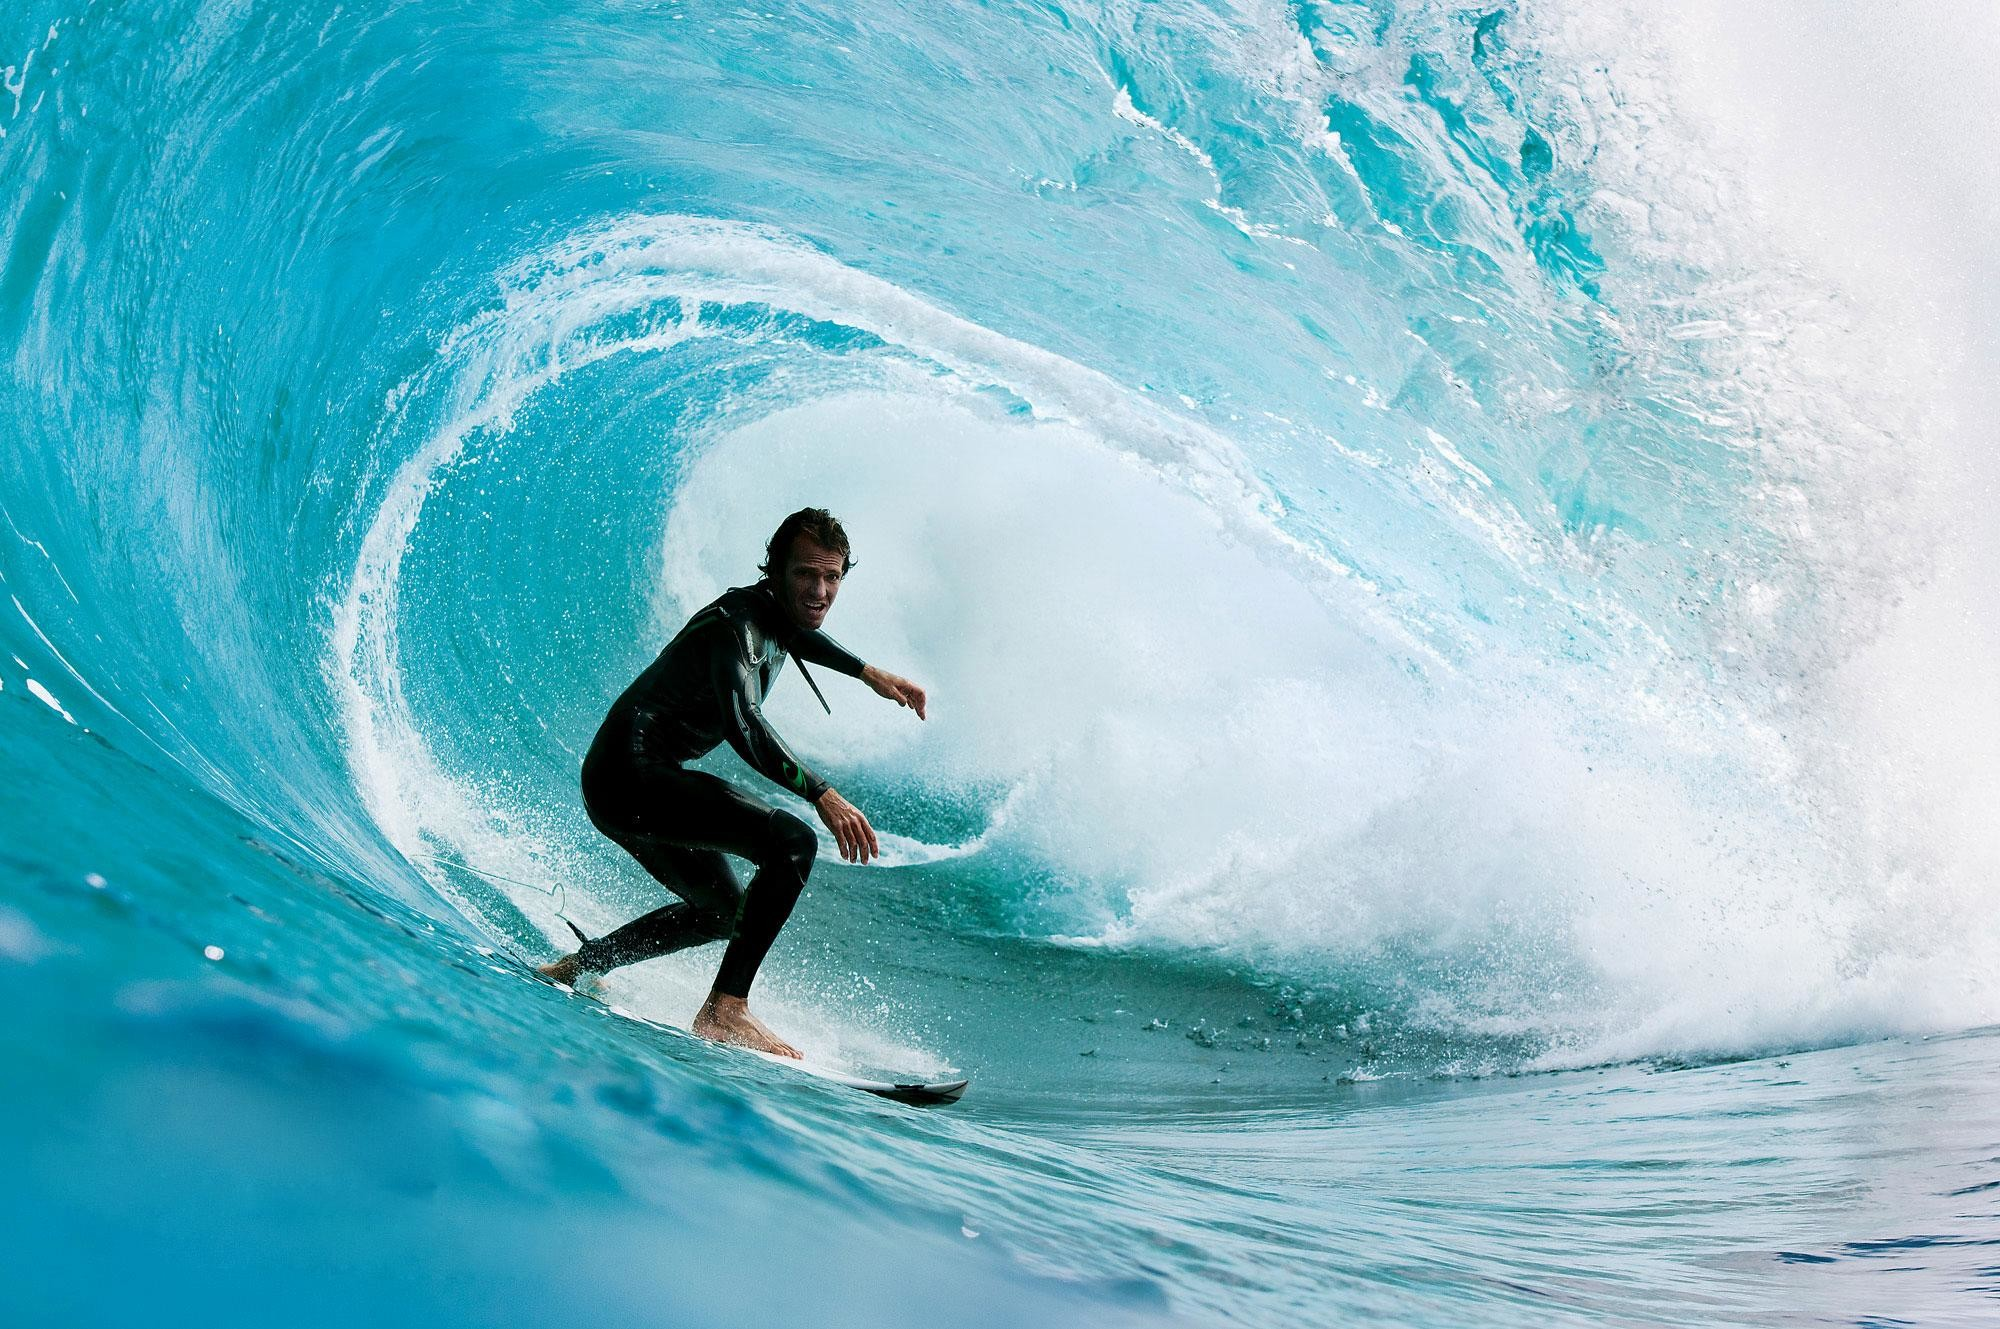 Surf-wallpaper-cory-lopez-corey-wilson